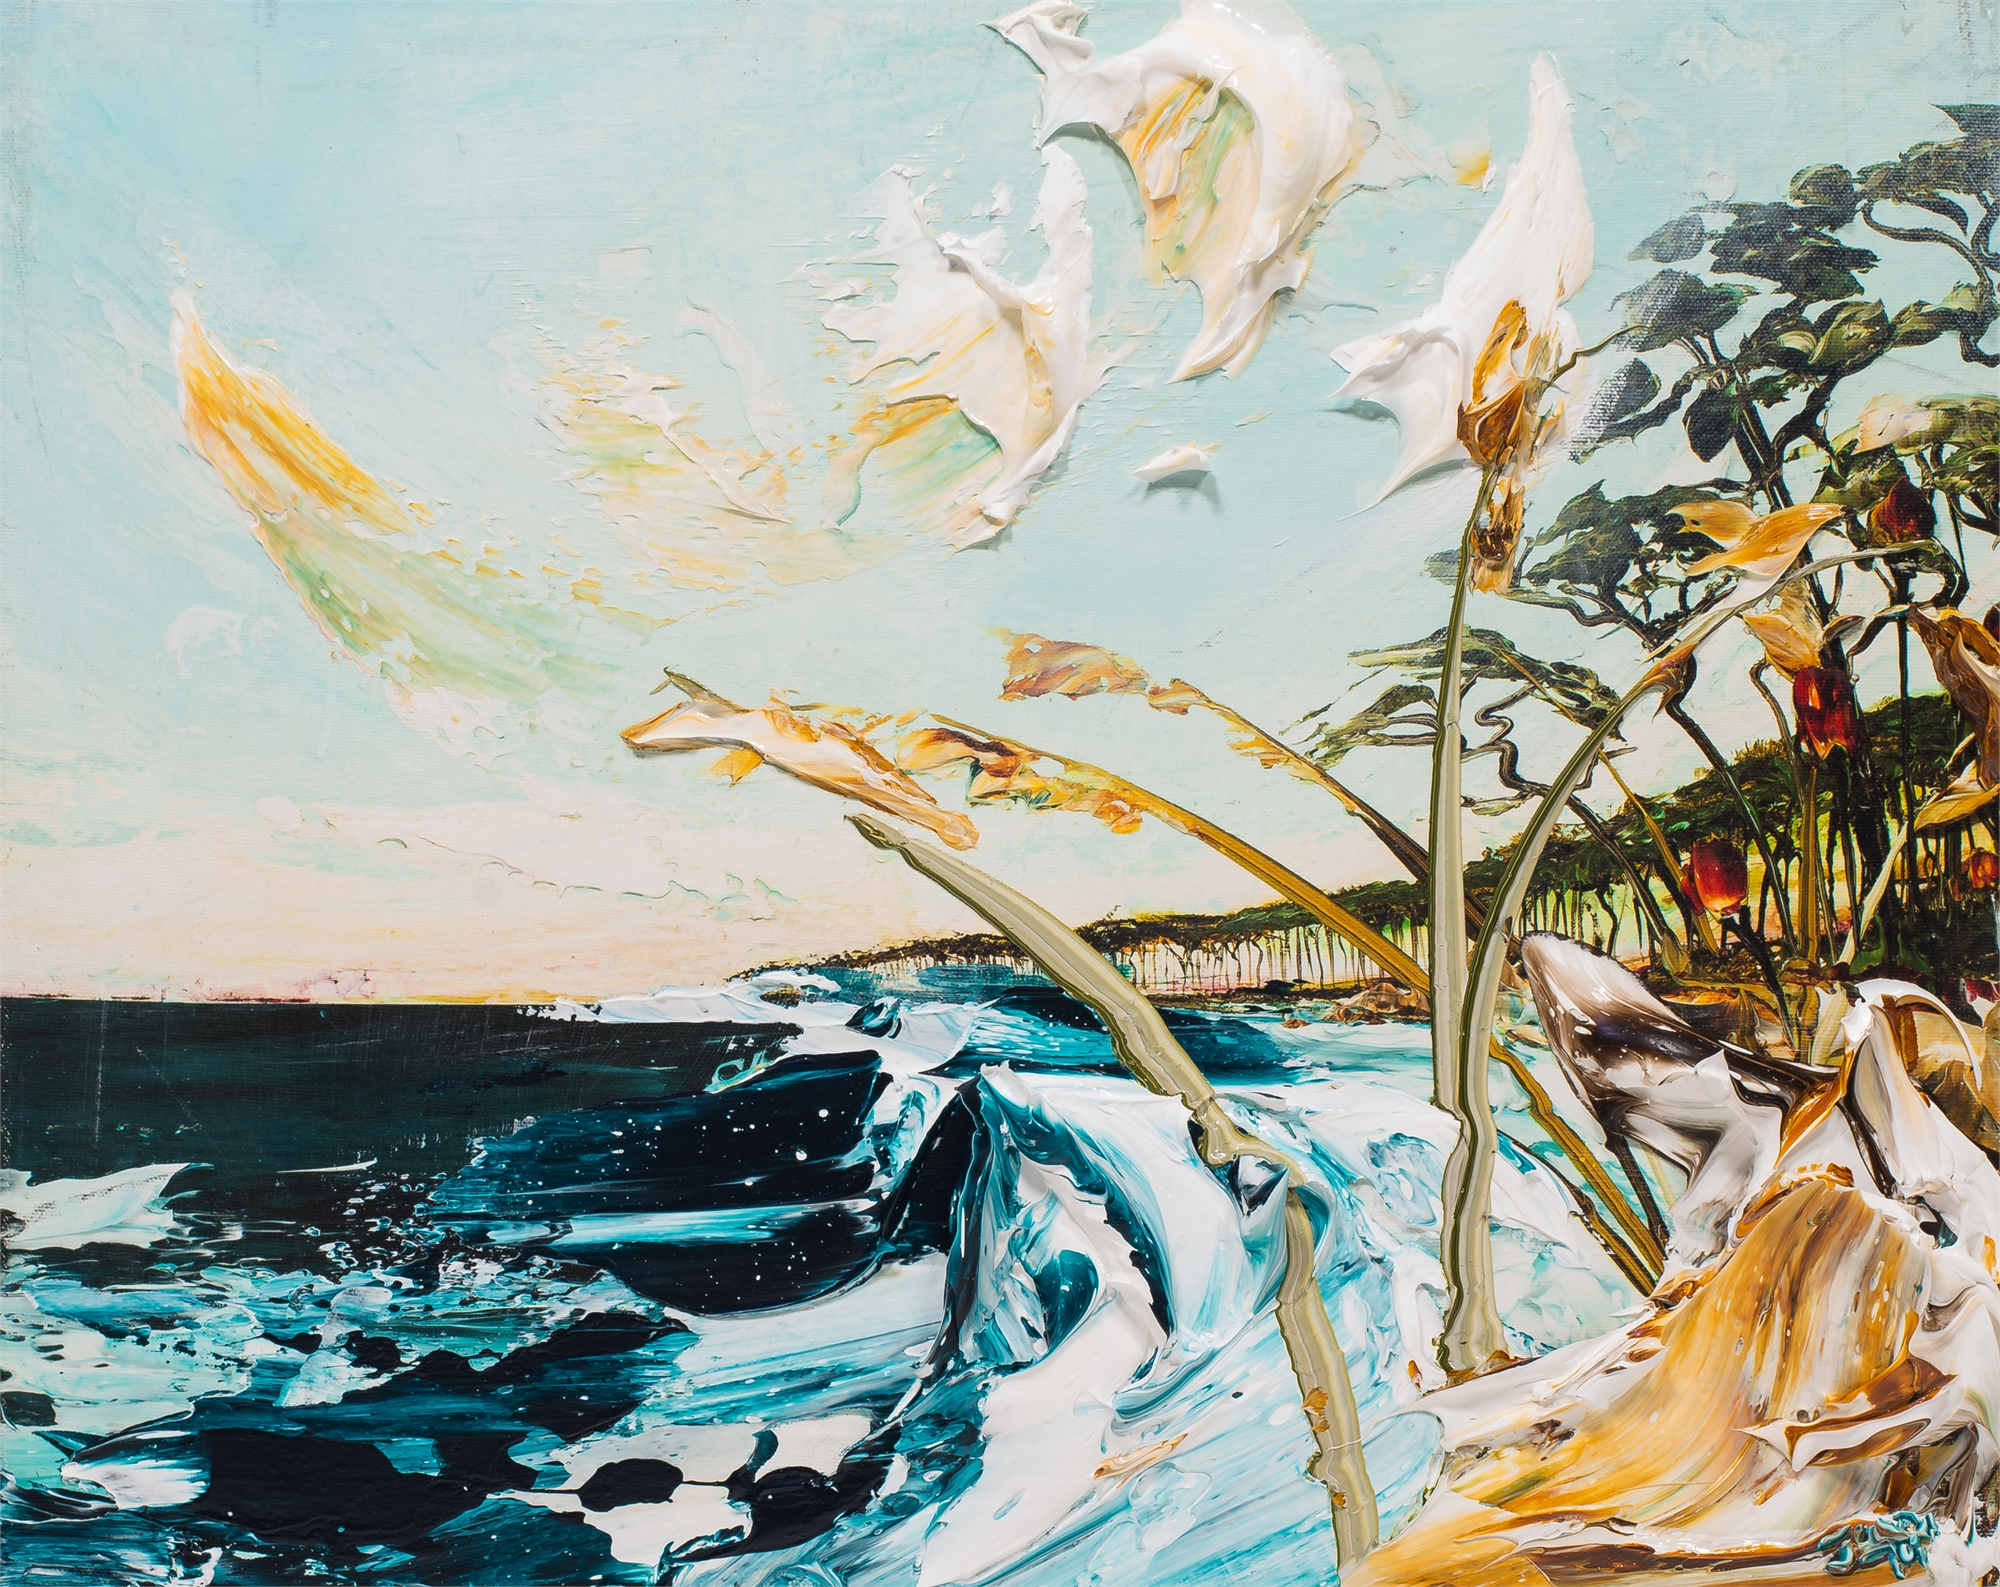 SEASCAPE HPAE 21/50 by Justin Gaffrey